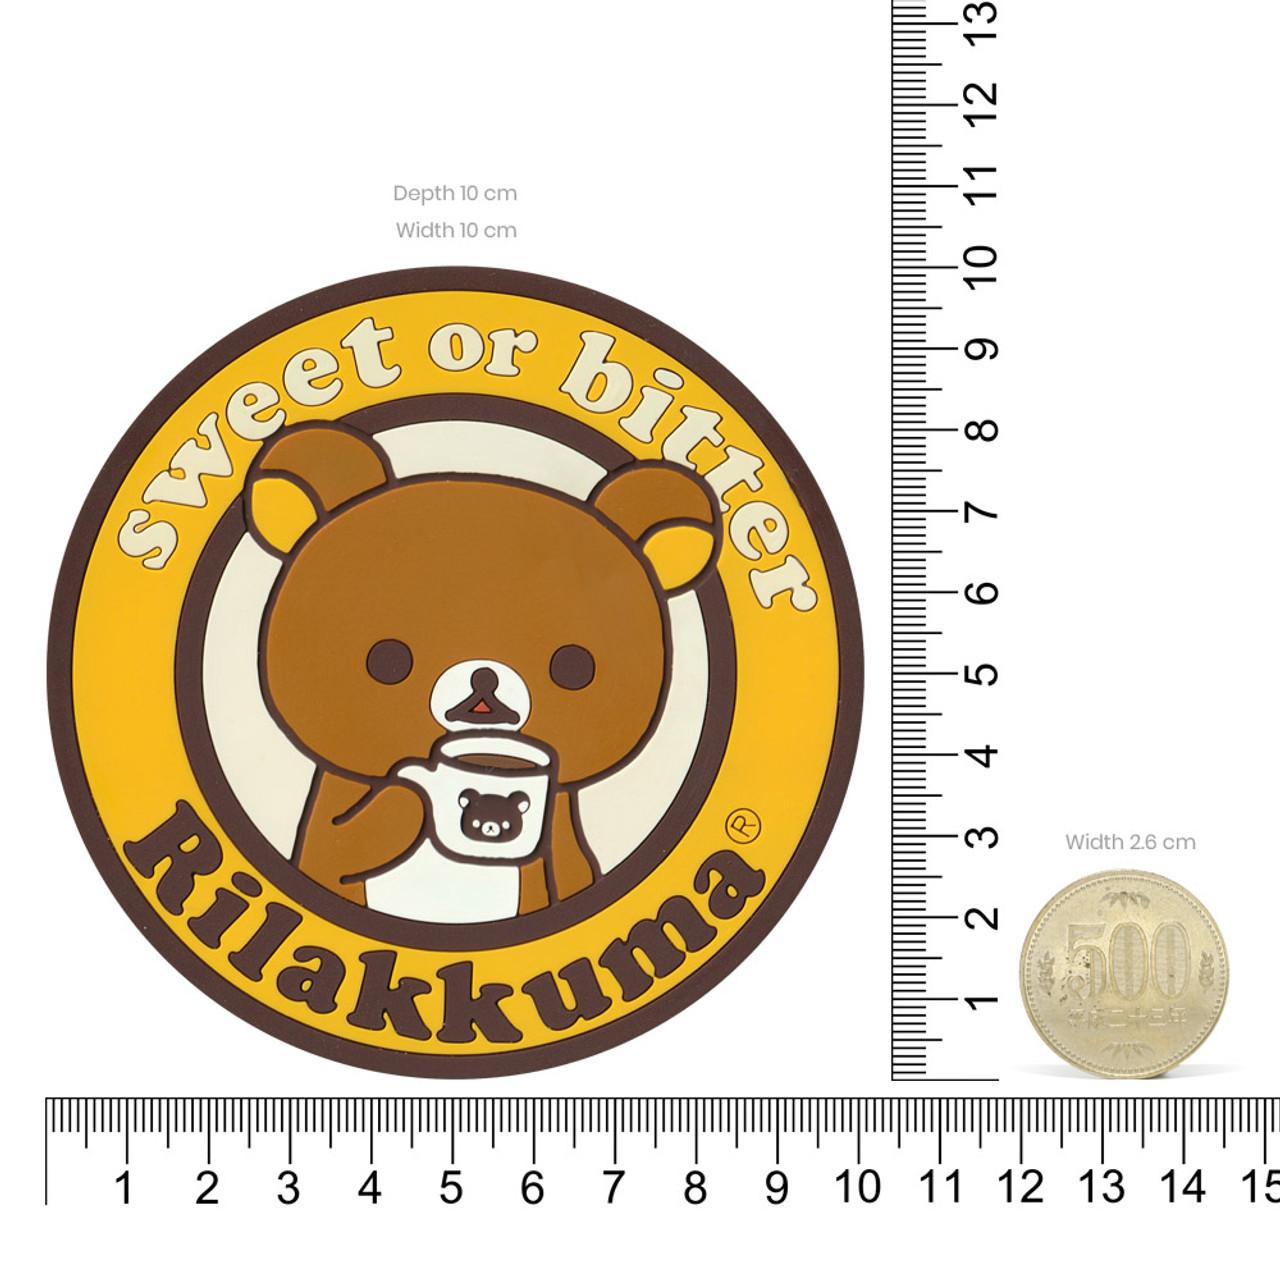 San-x Rilakkuma Circle Chocolate Coffee Cup Coaster - KY00901 ( Proportion )